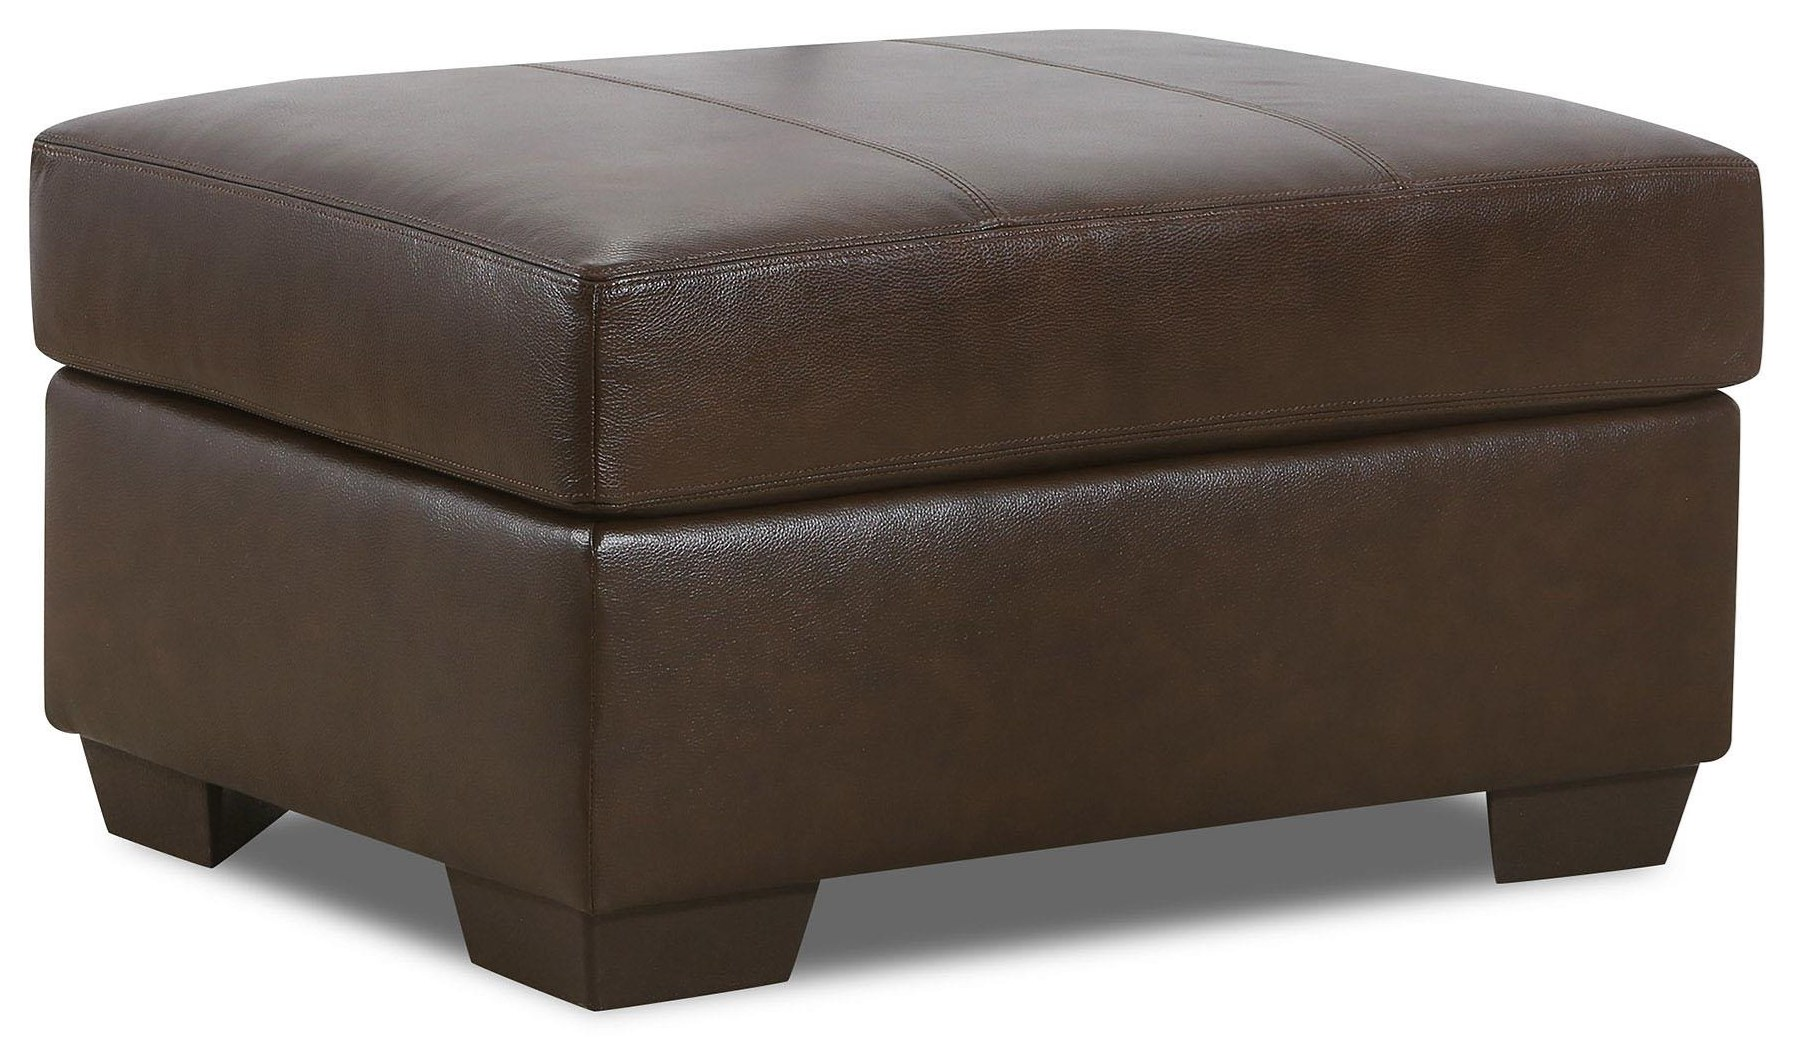 2075 Leather Storage Ottoman by Lane at Furniture Fair - North Carolina